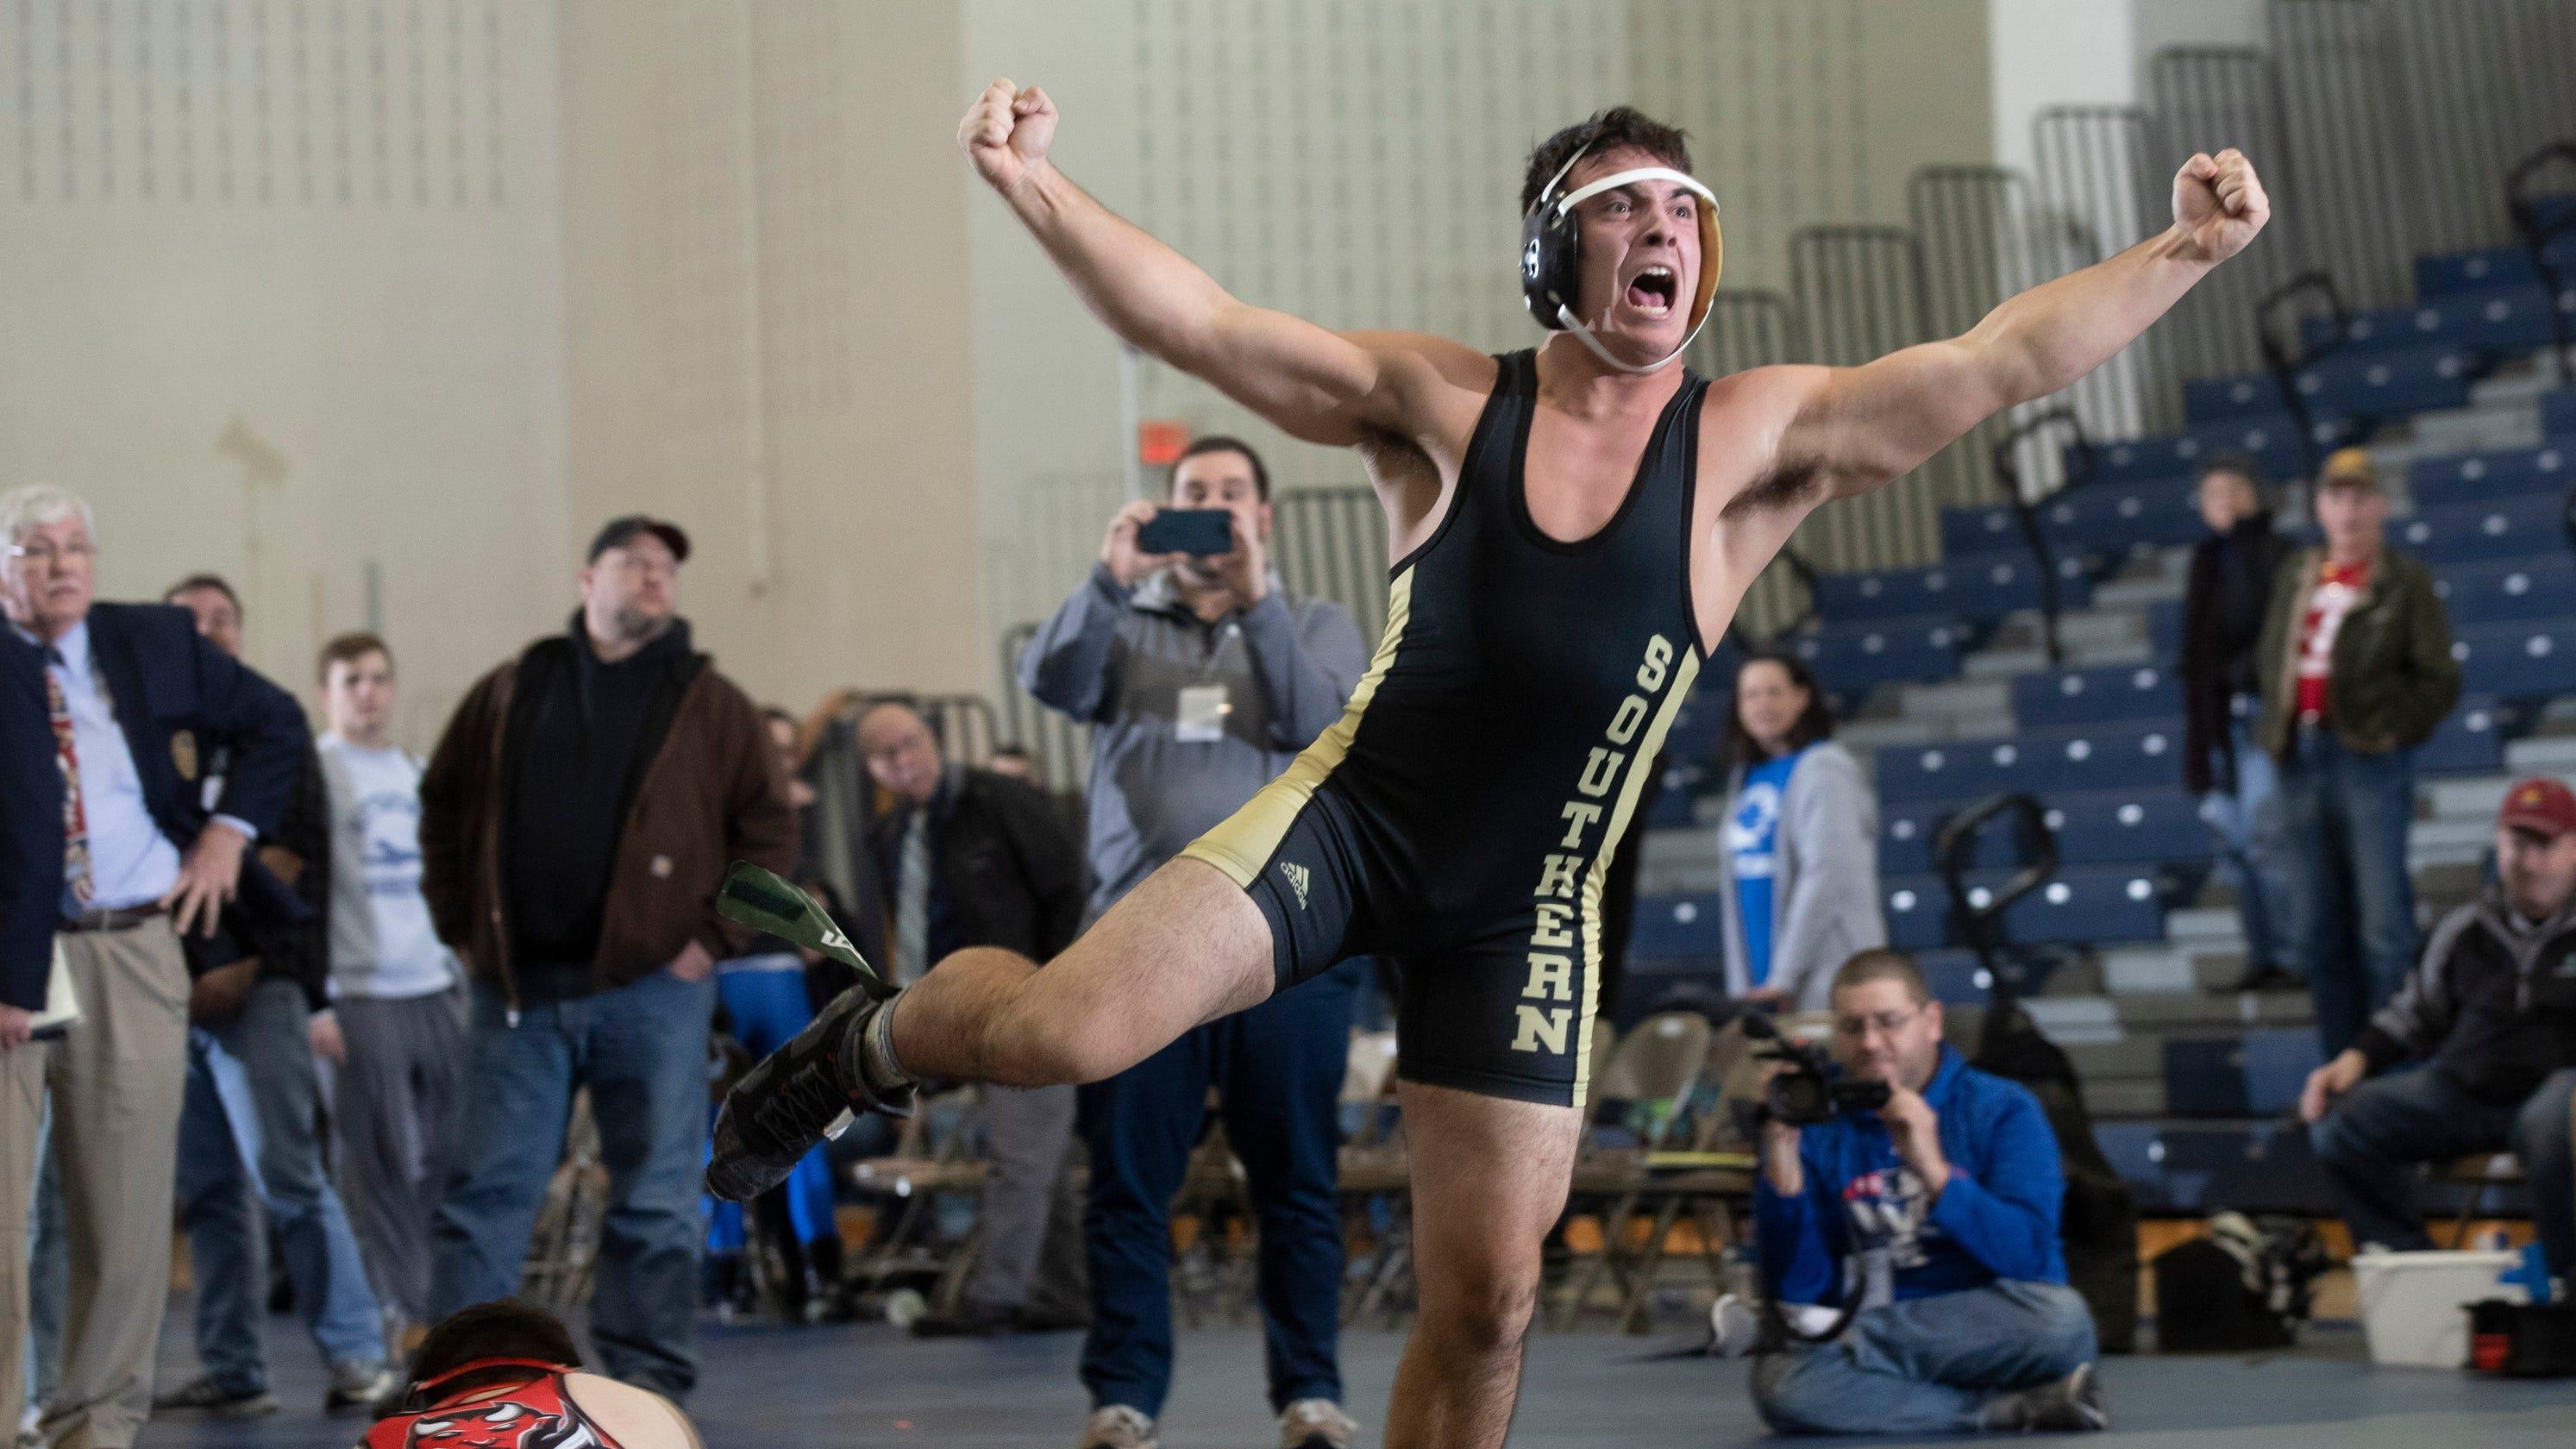 NJ wrestling: Southern wins Group V championship